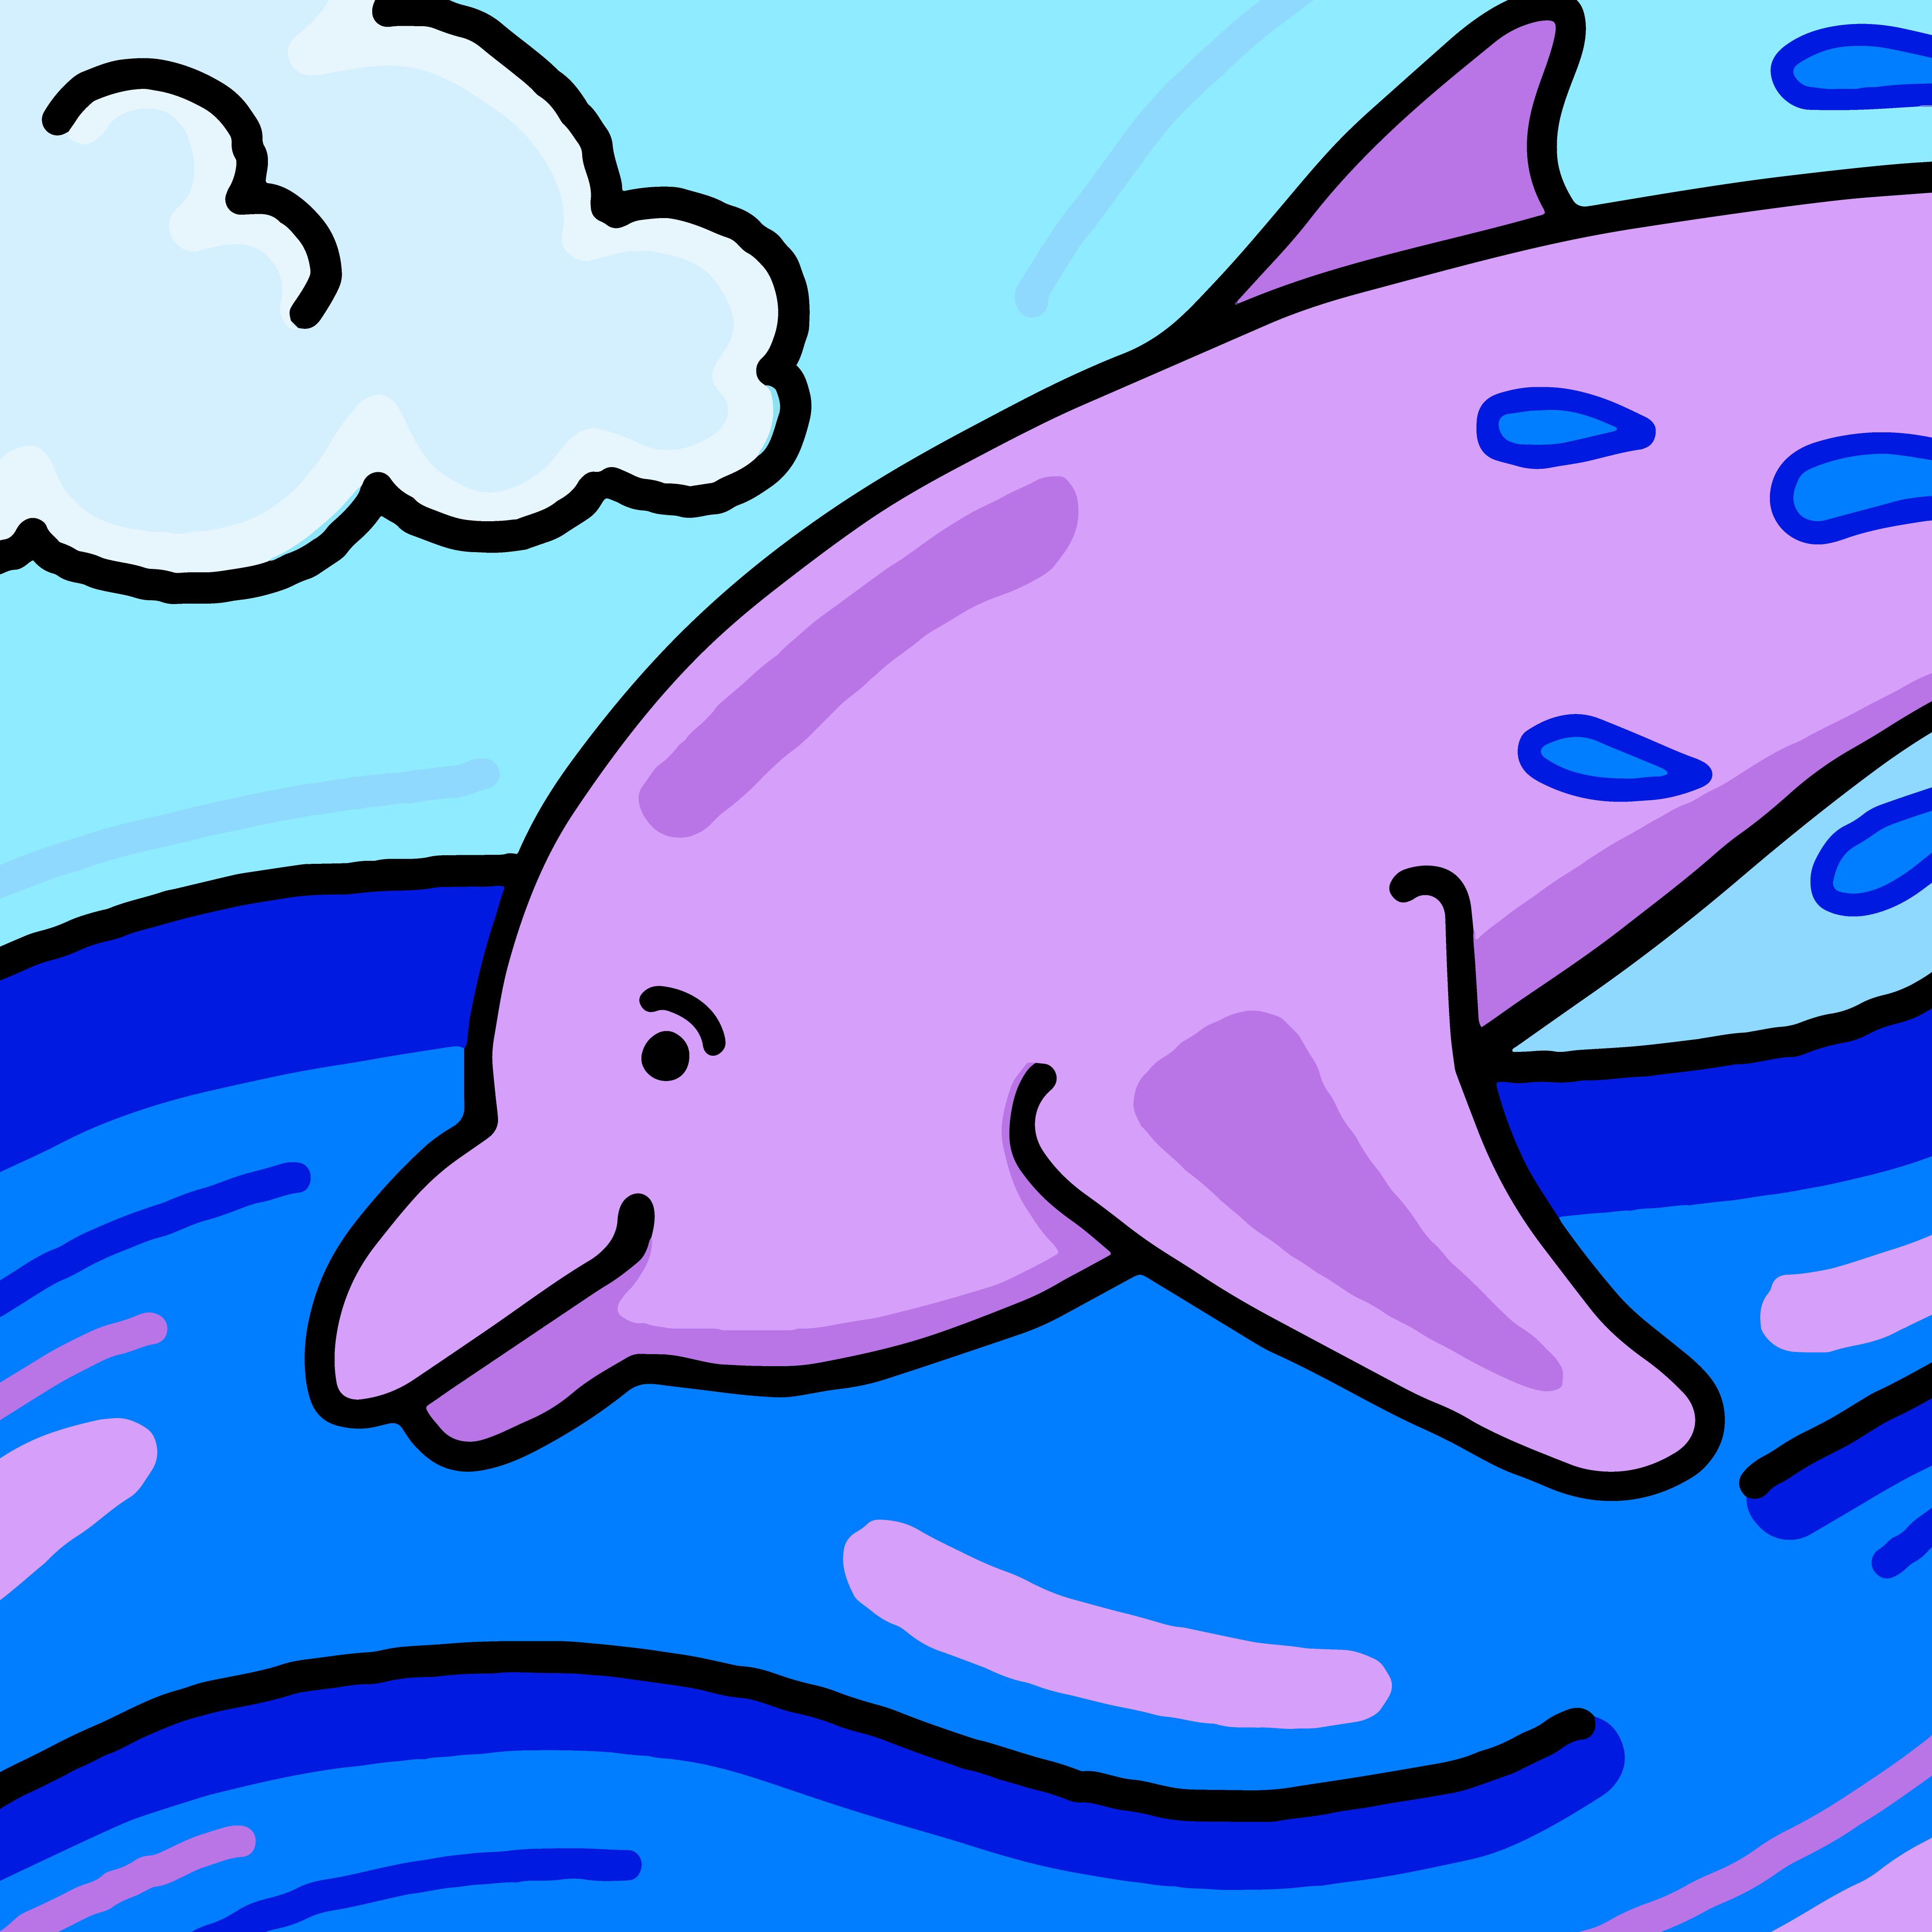 dolphin via Mina Tocalini for use by 360 Magazine